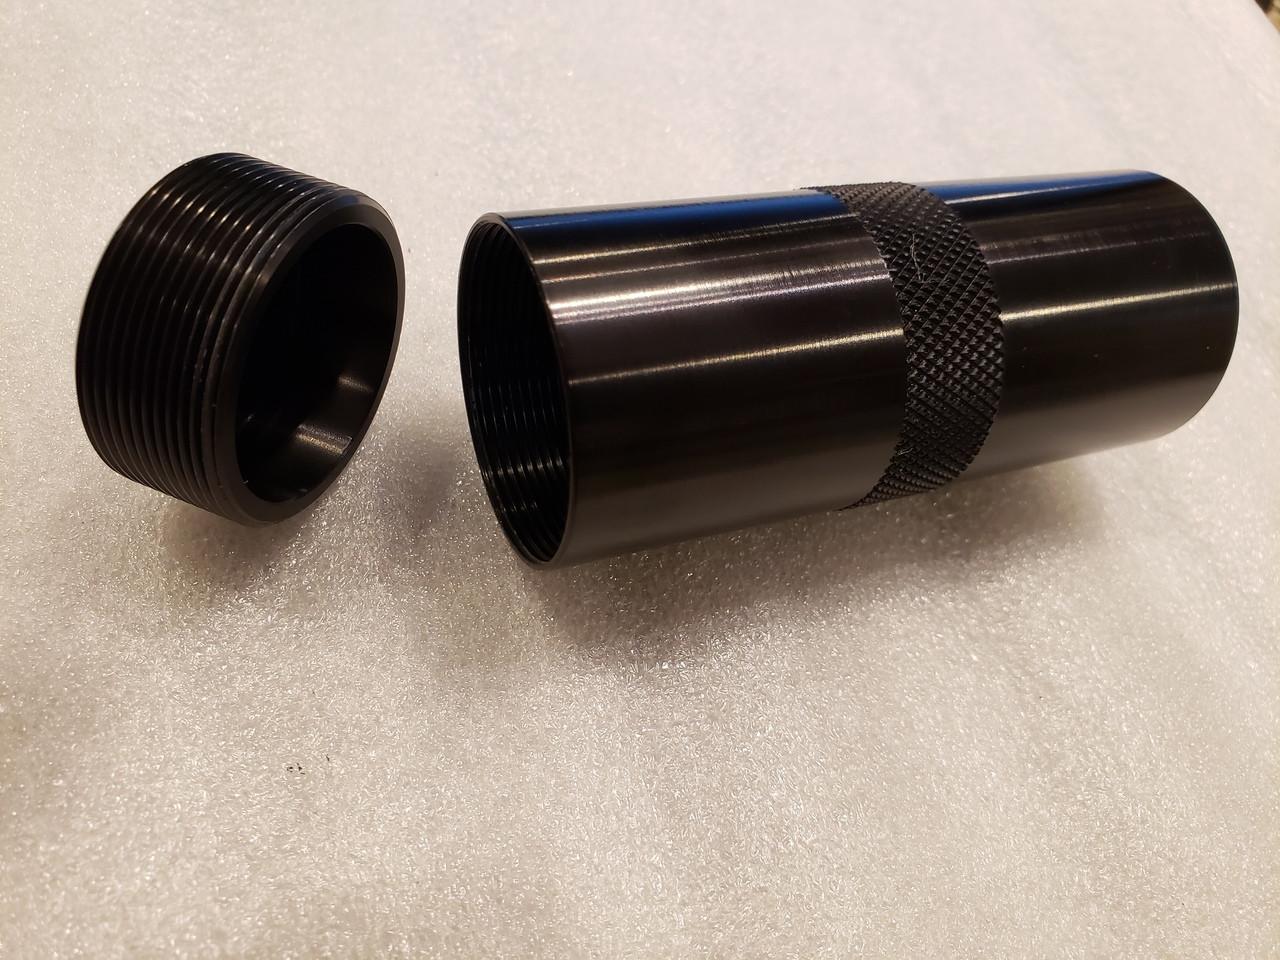 SJC Blast Diverter and Adaptor